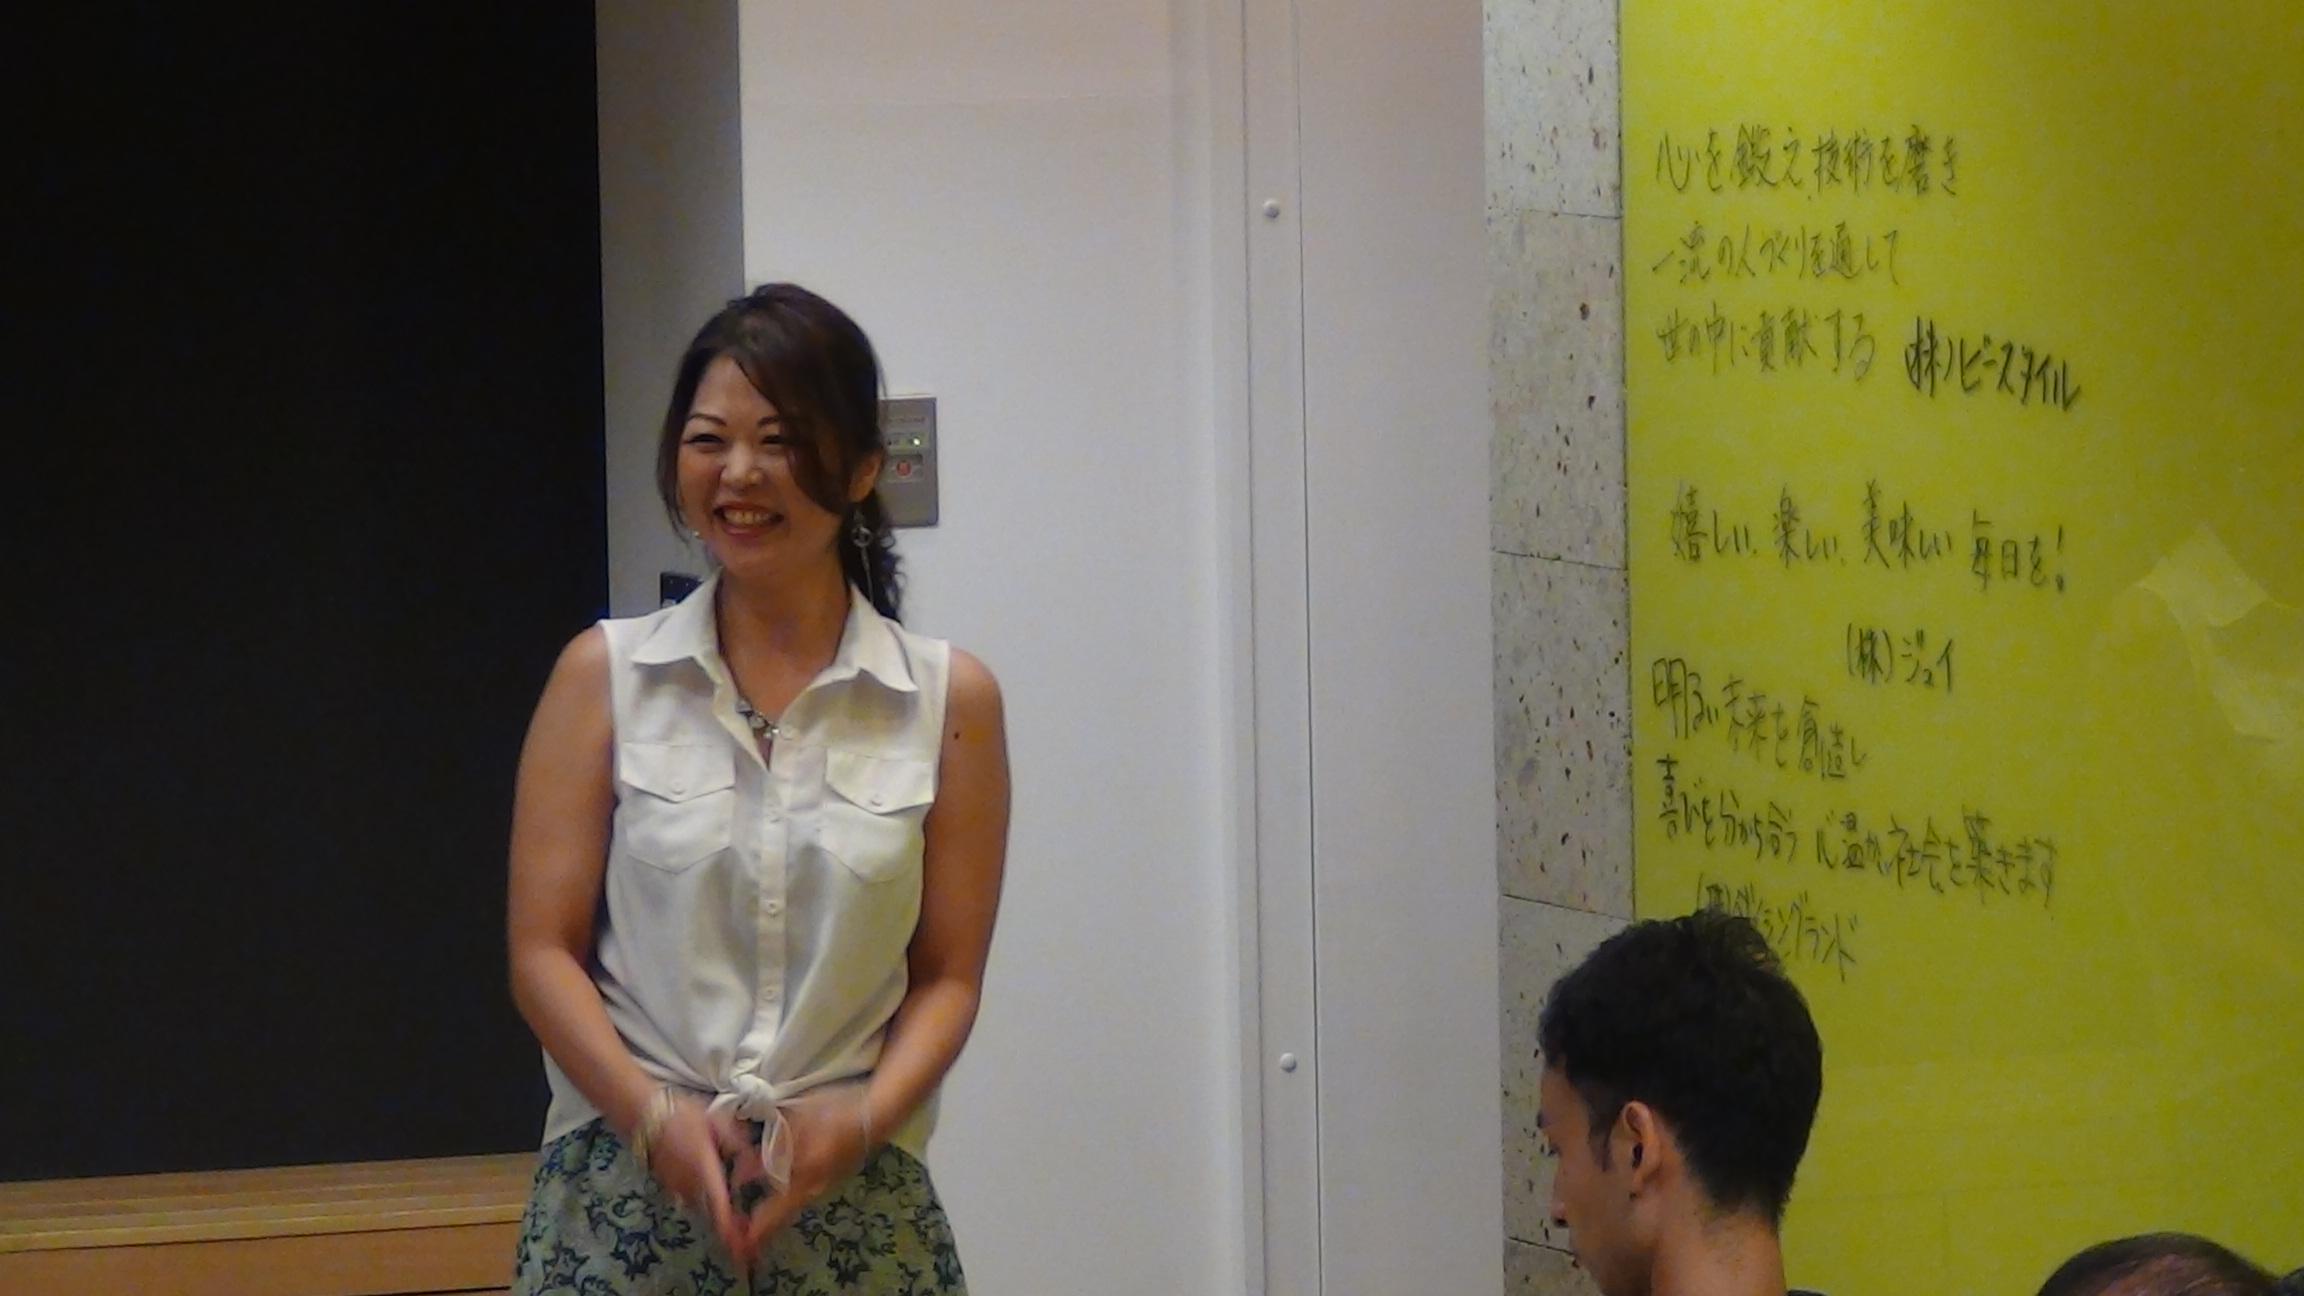 DSC00444 1 - 2017年8月5日東京思風塾「心が燃える理念とは〜自社の理念を問い直す〜」